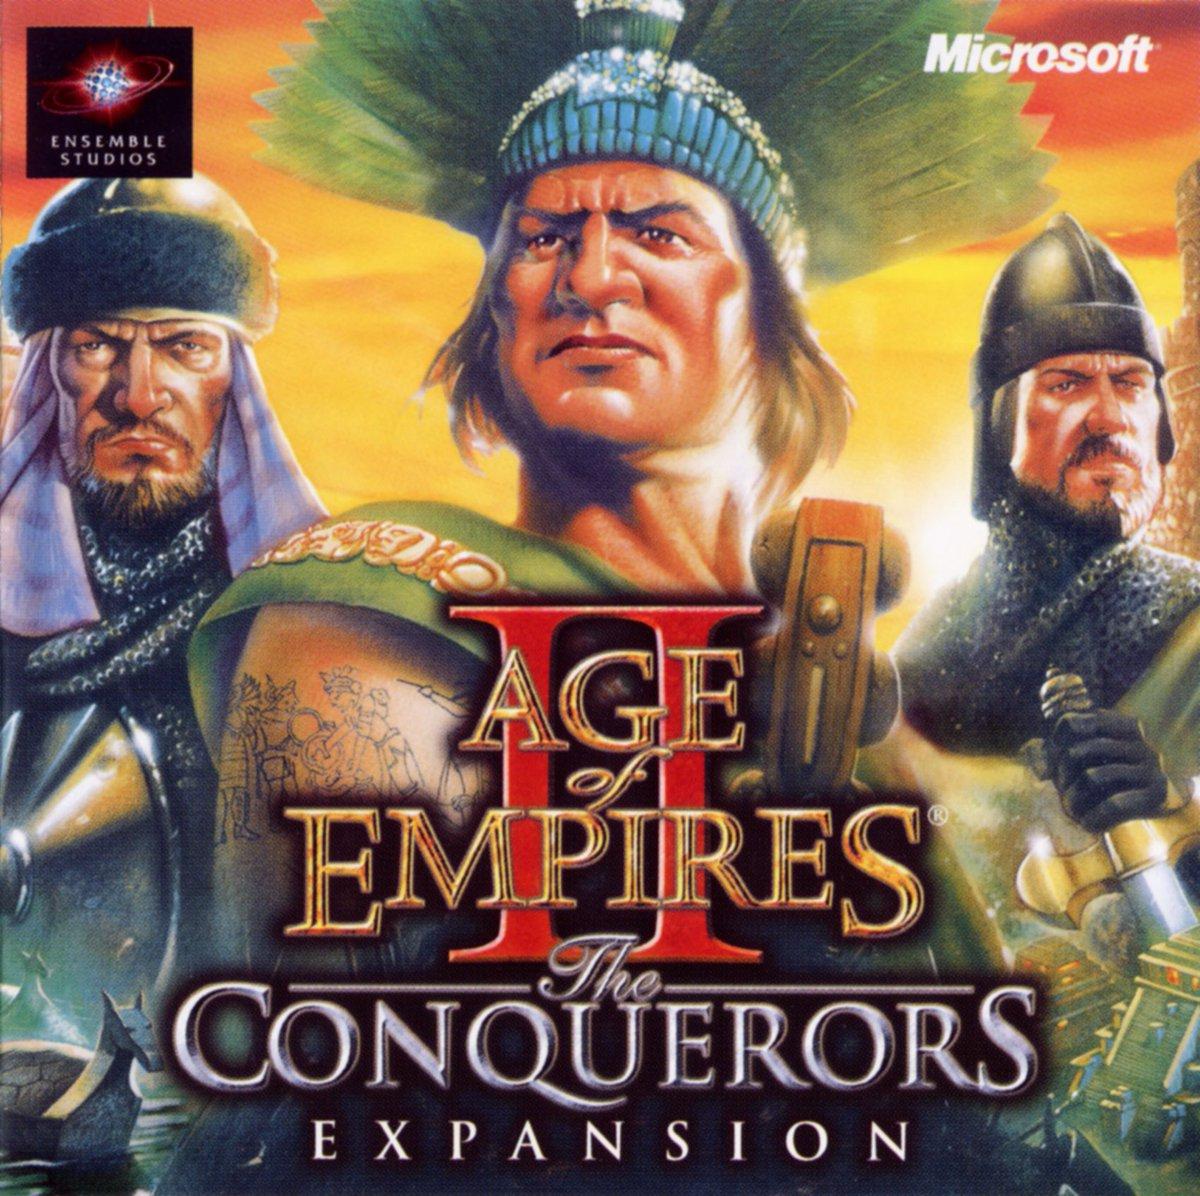 читы age of empires 2 the conquerors